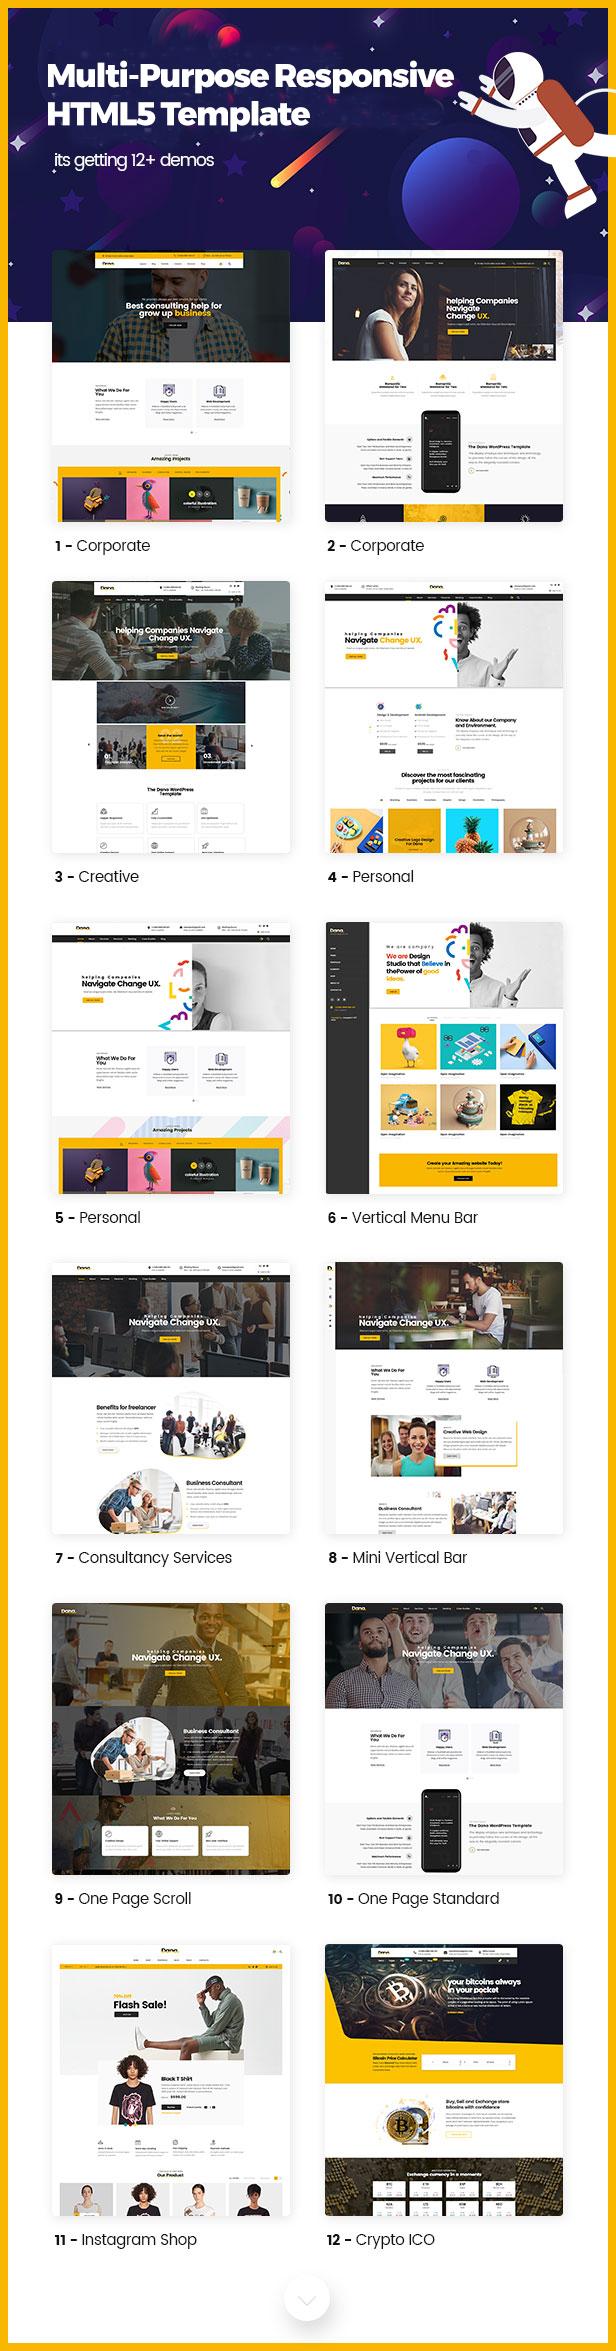 Dana - Corporate Business Multi-Purpose Responsive HTML5 Template - 1